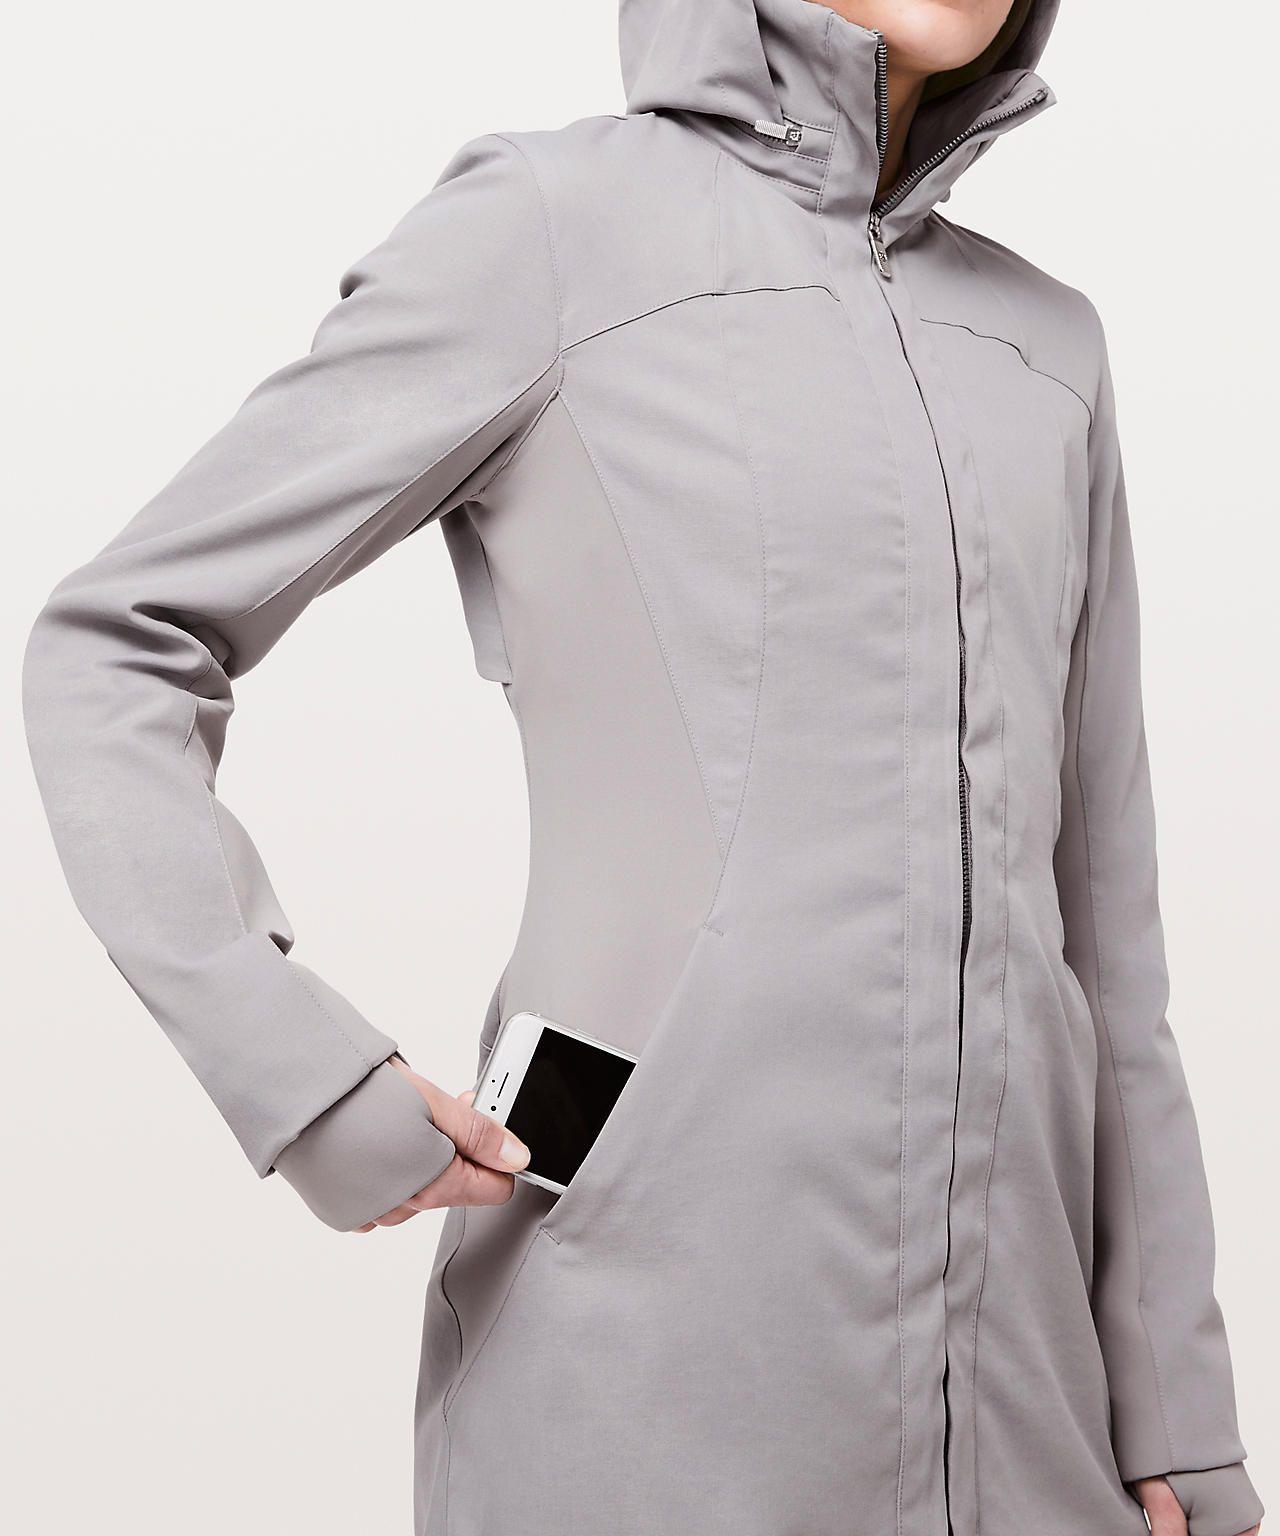 Dark Chrome Sports Jackets Women Jackets Jackets For Women [ 1536 x 1280 Pixel ]